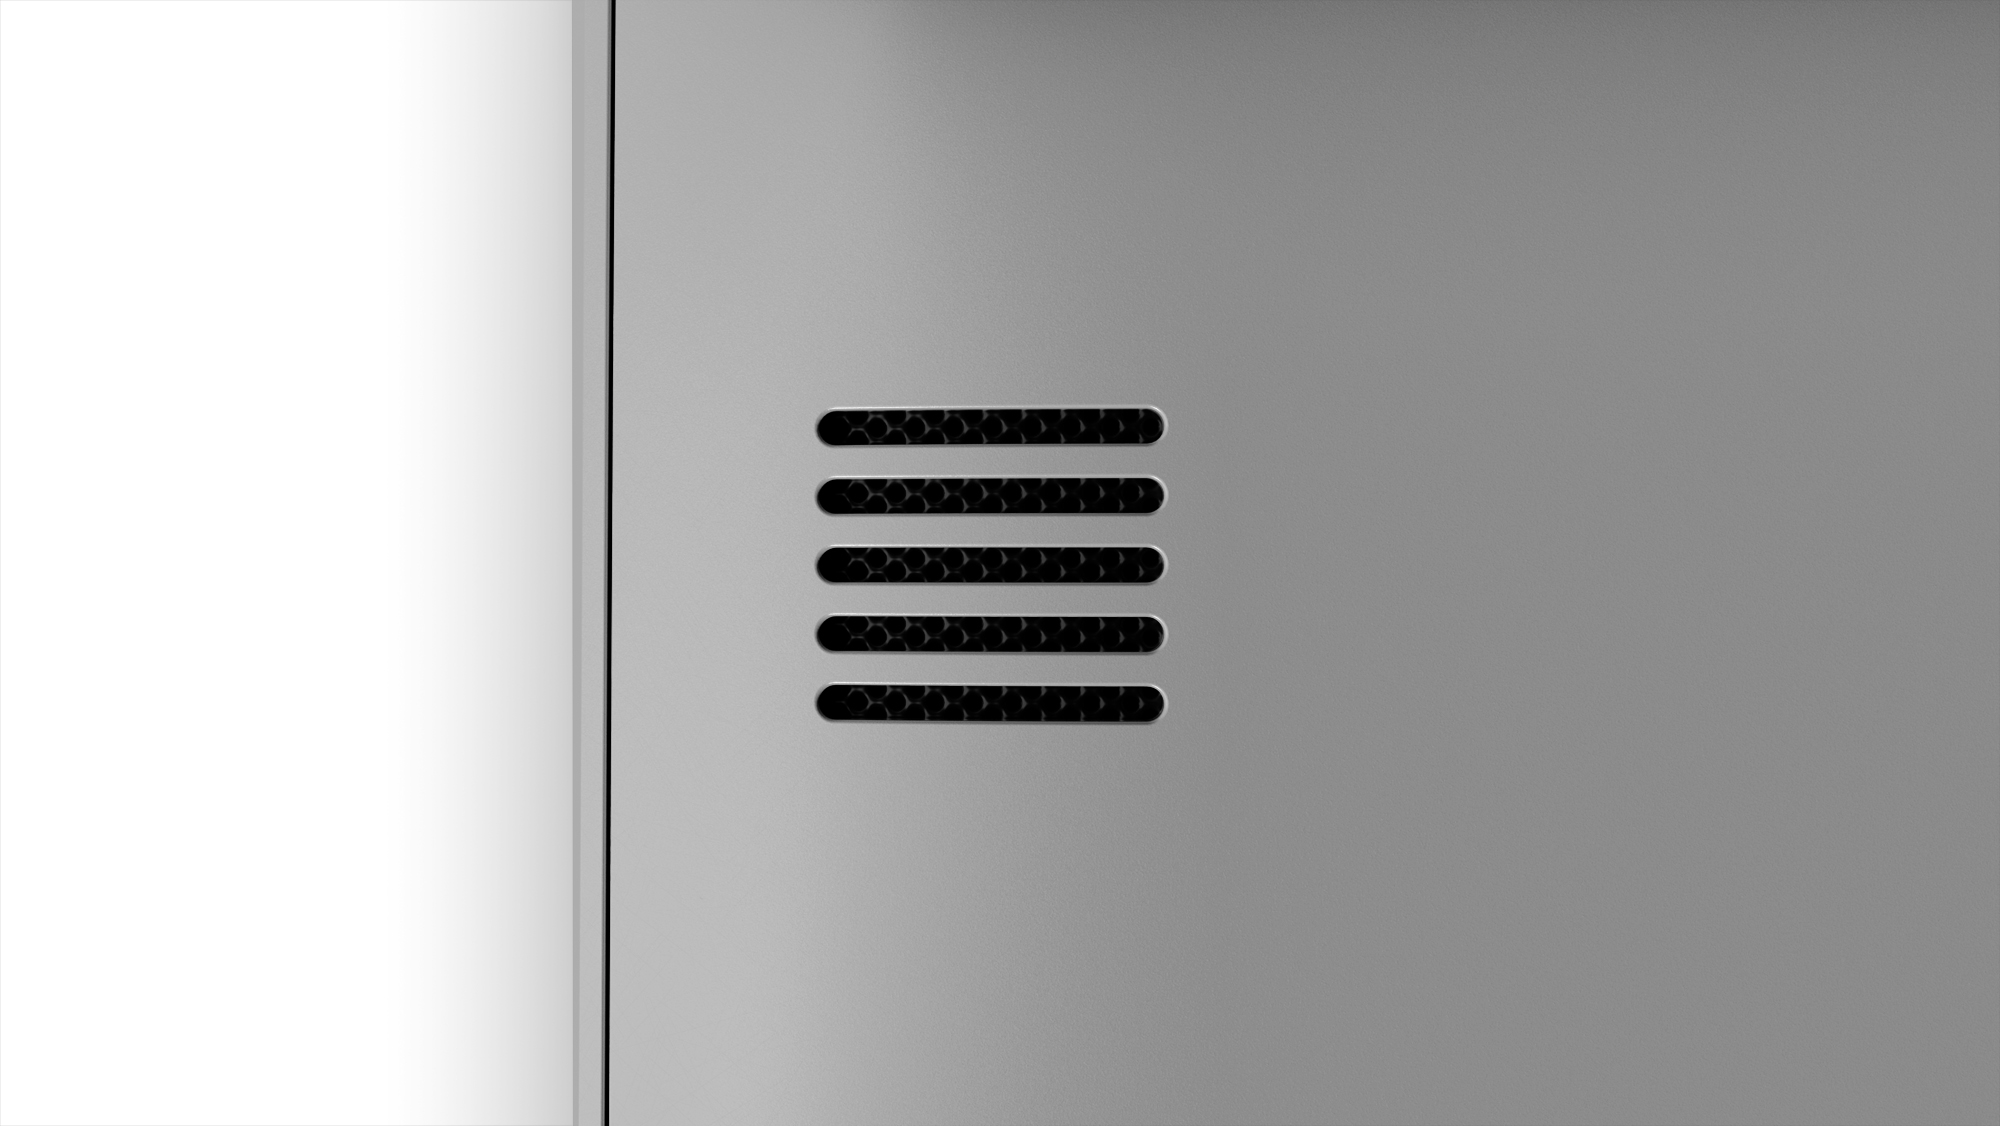 Фото  Ультрабук Lenovo ideapad 320s-13 Mineral Grey (81AK00ESRA)